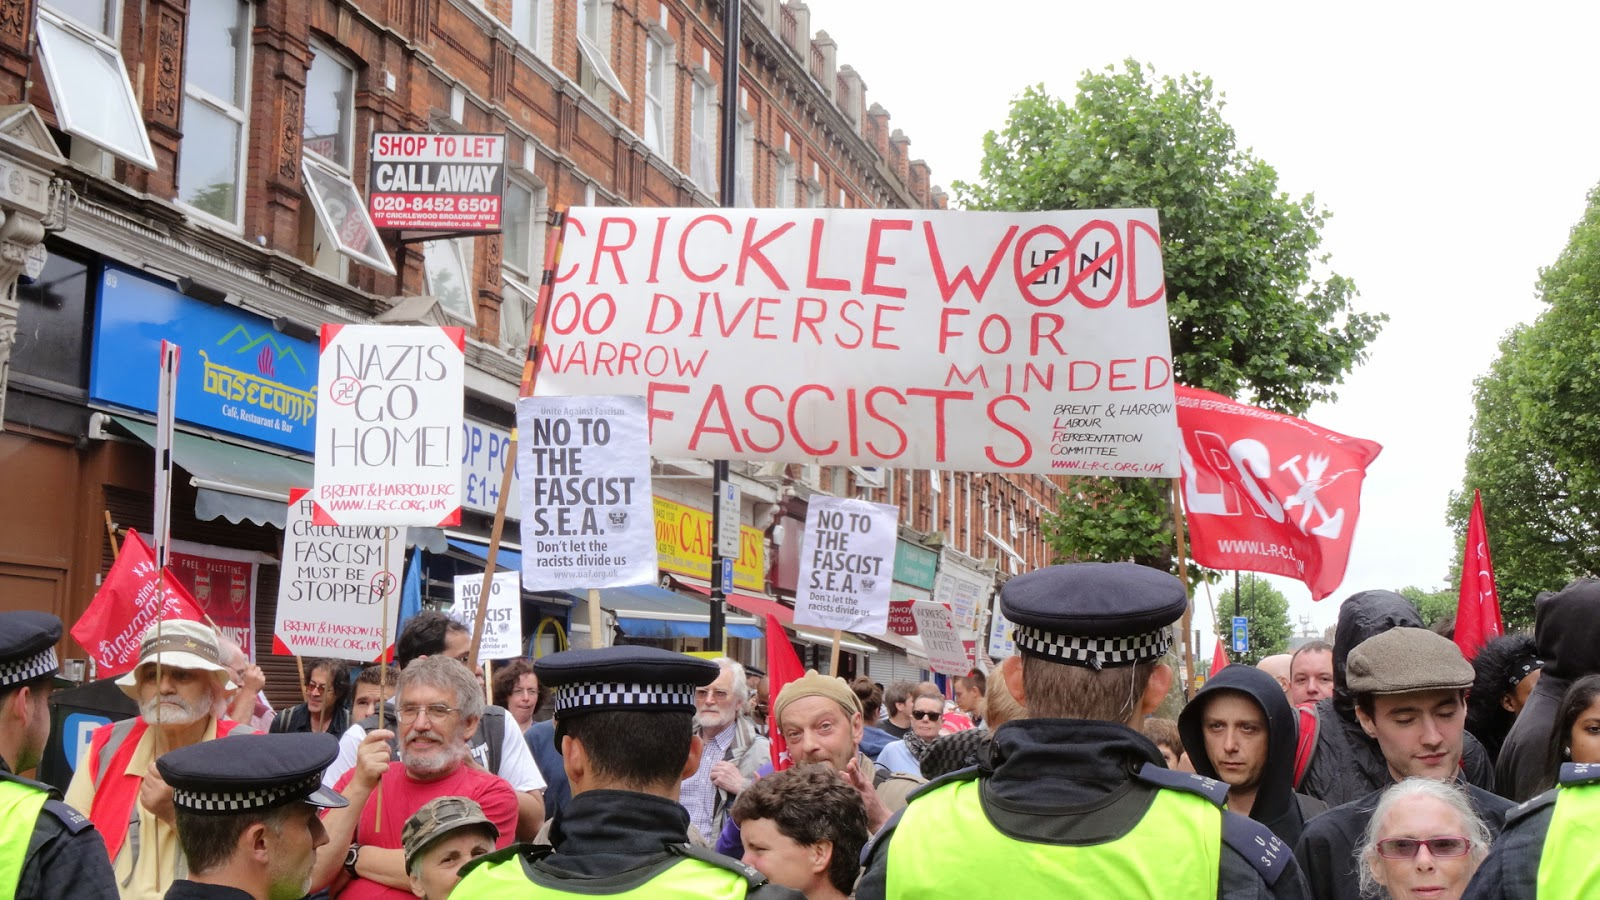 Cricklewood anti-SEA protest